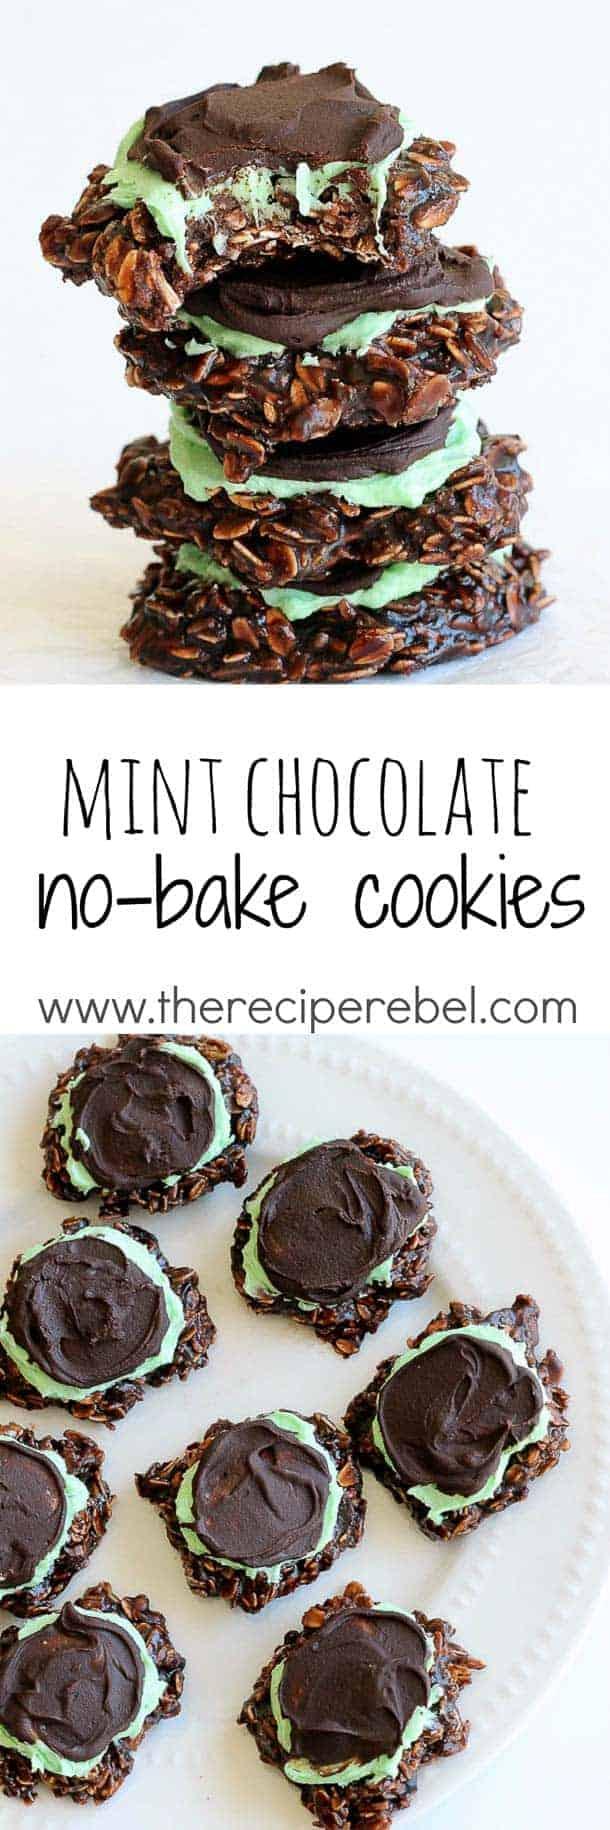 Fudgy Mint Chocolate No-Bake Cookies - The Recipe Rebel